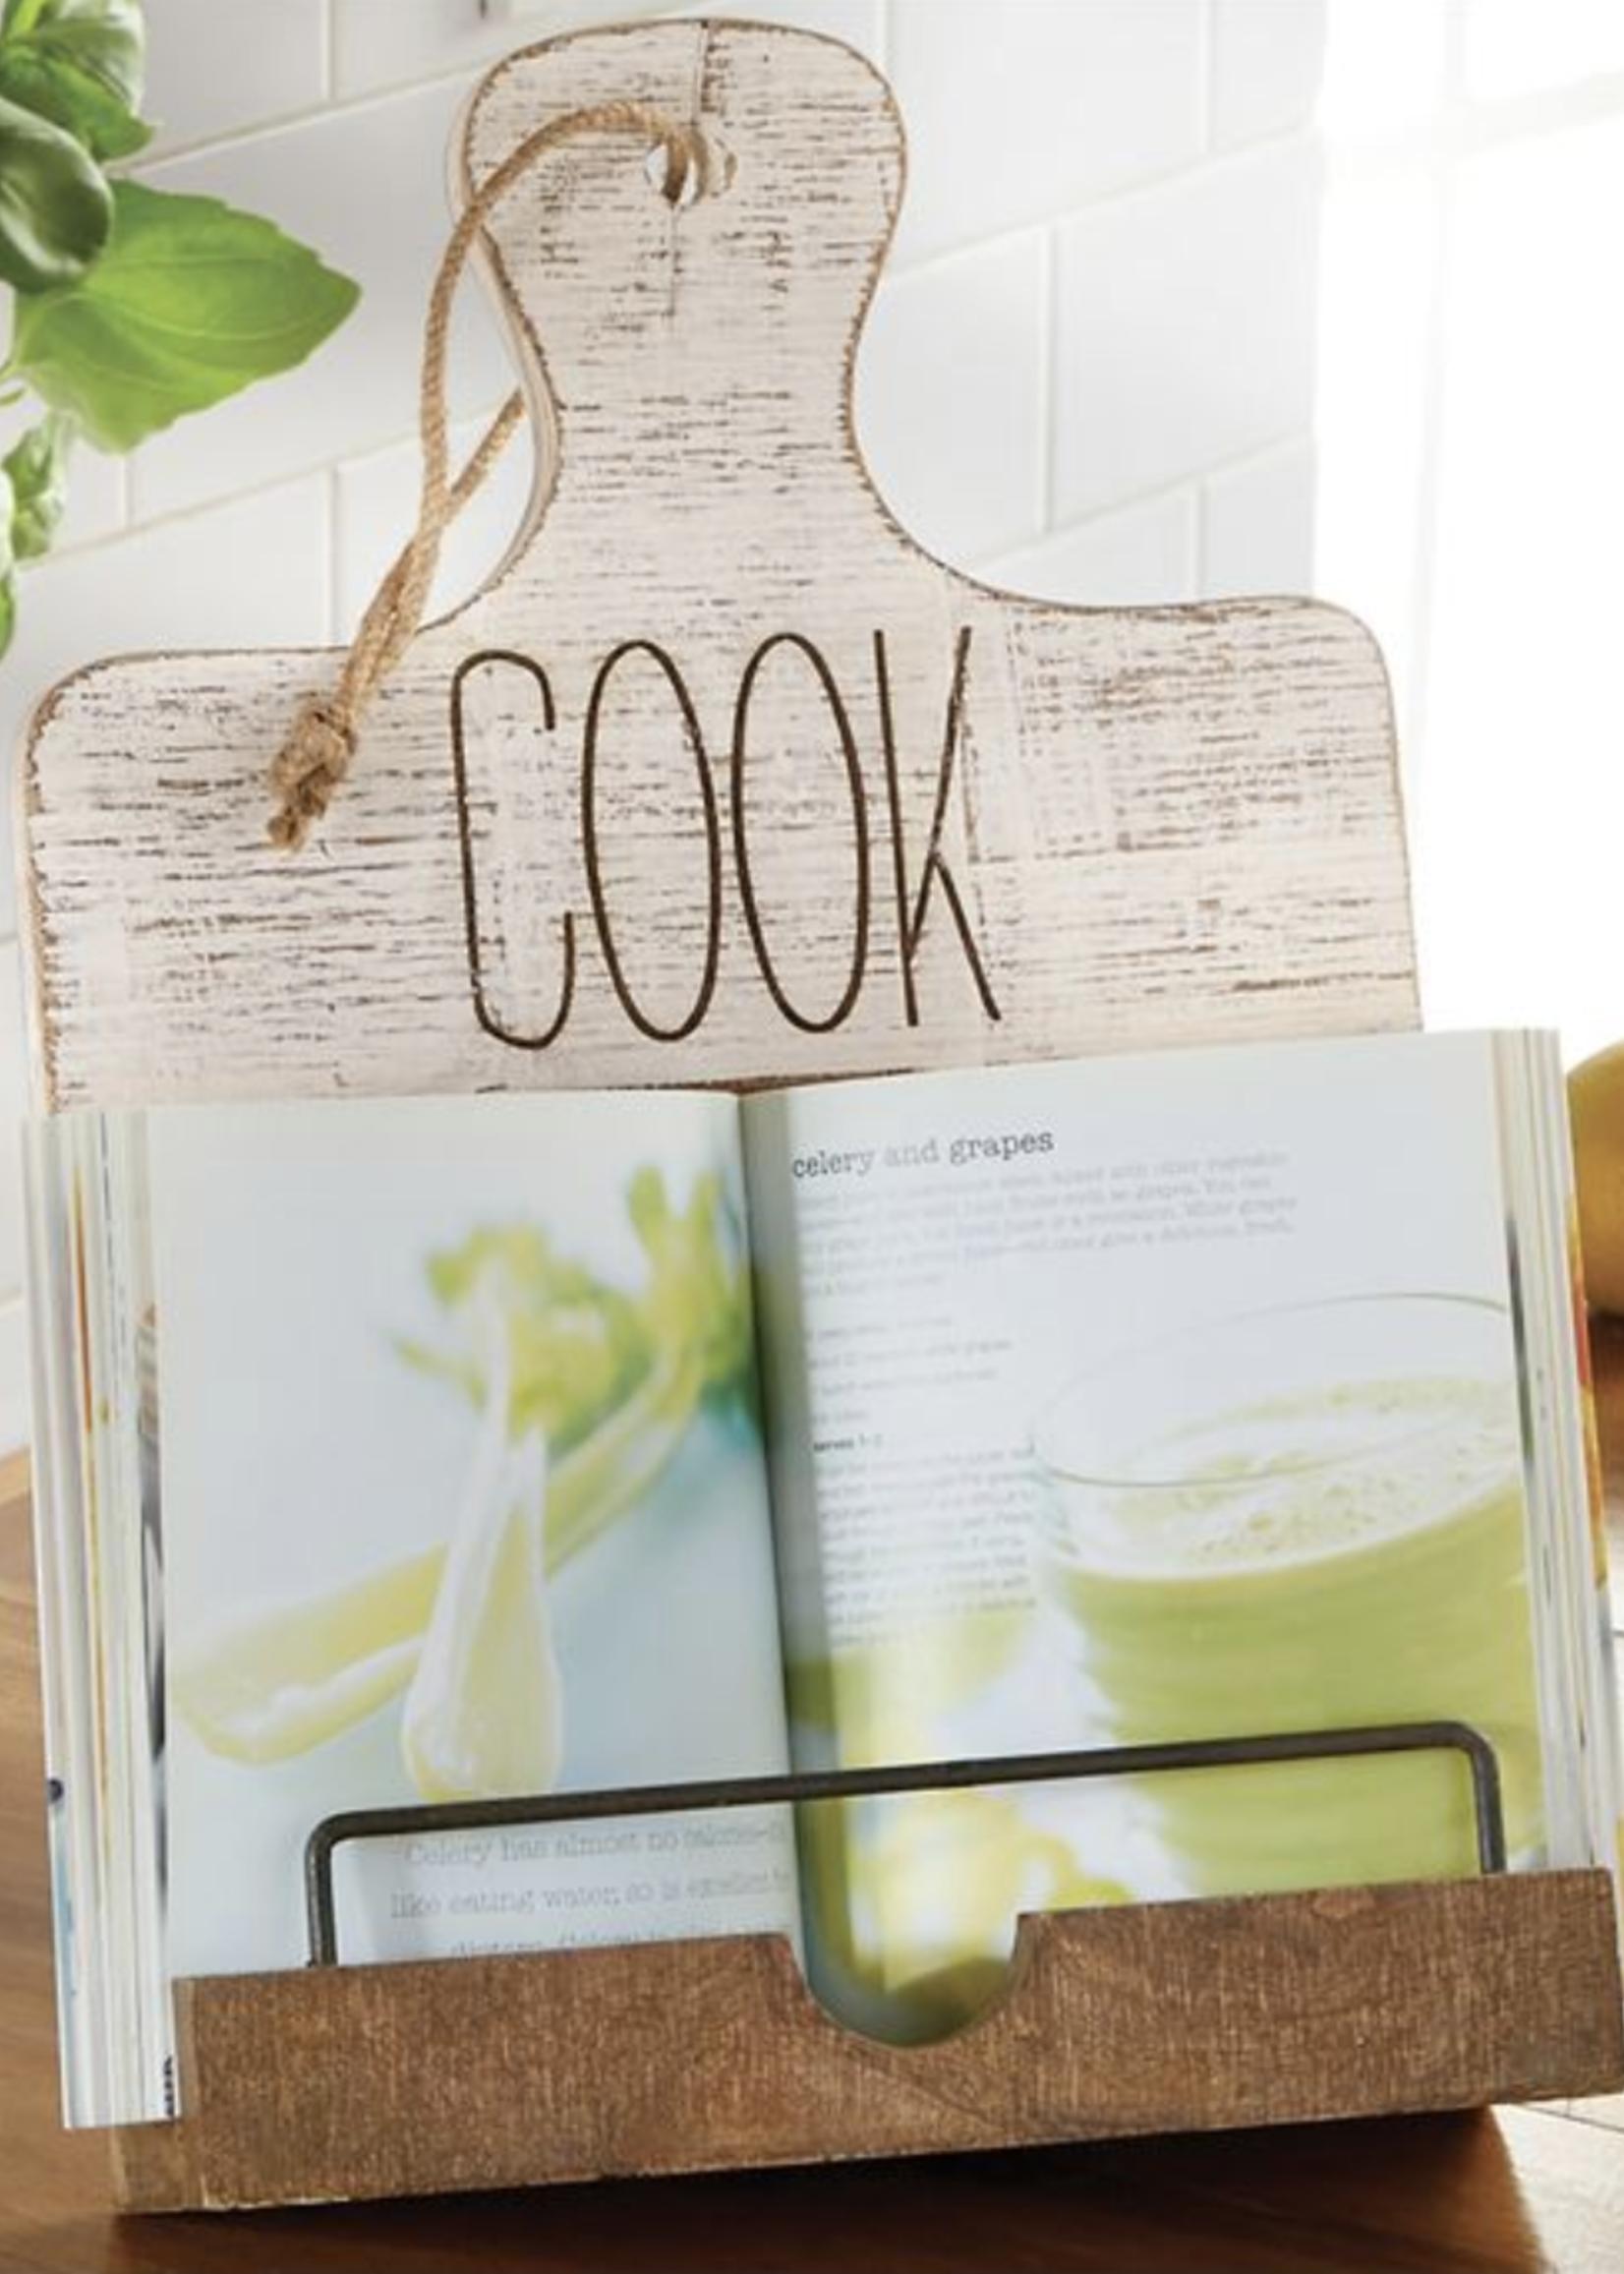 Mud Pie Cookbook Holder | Cook